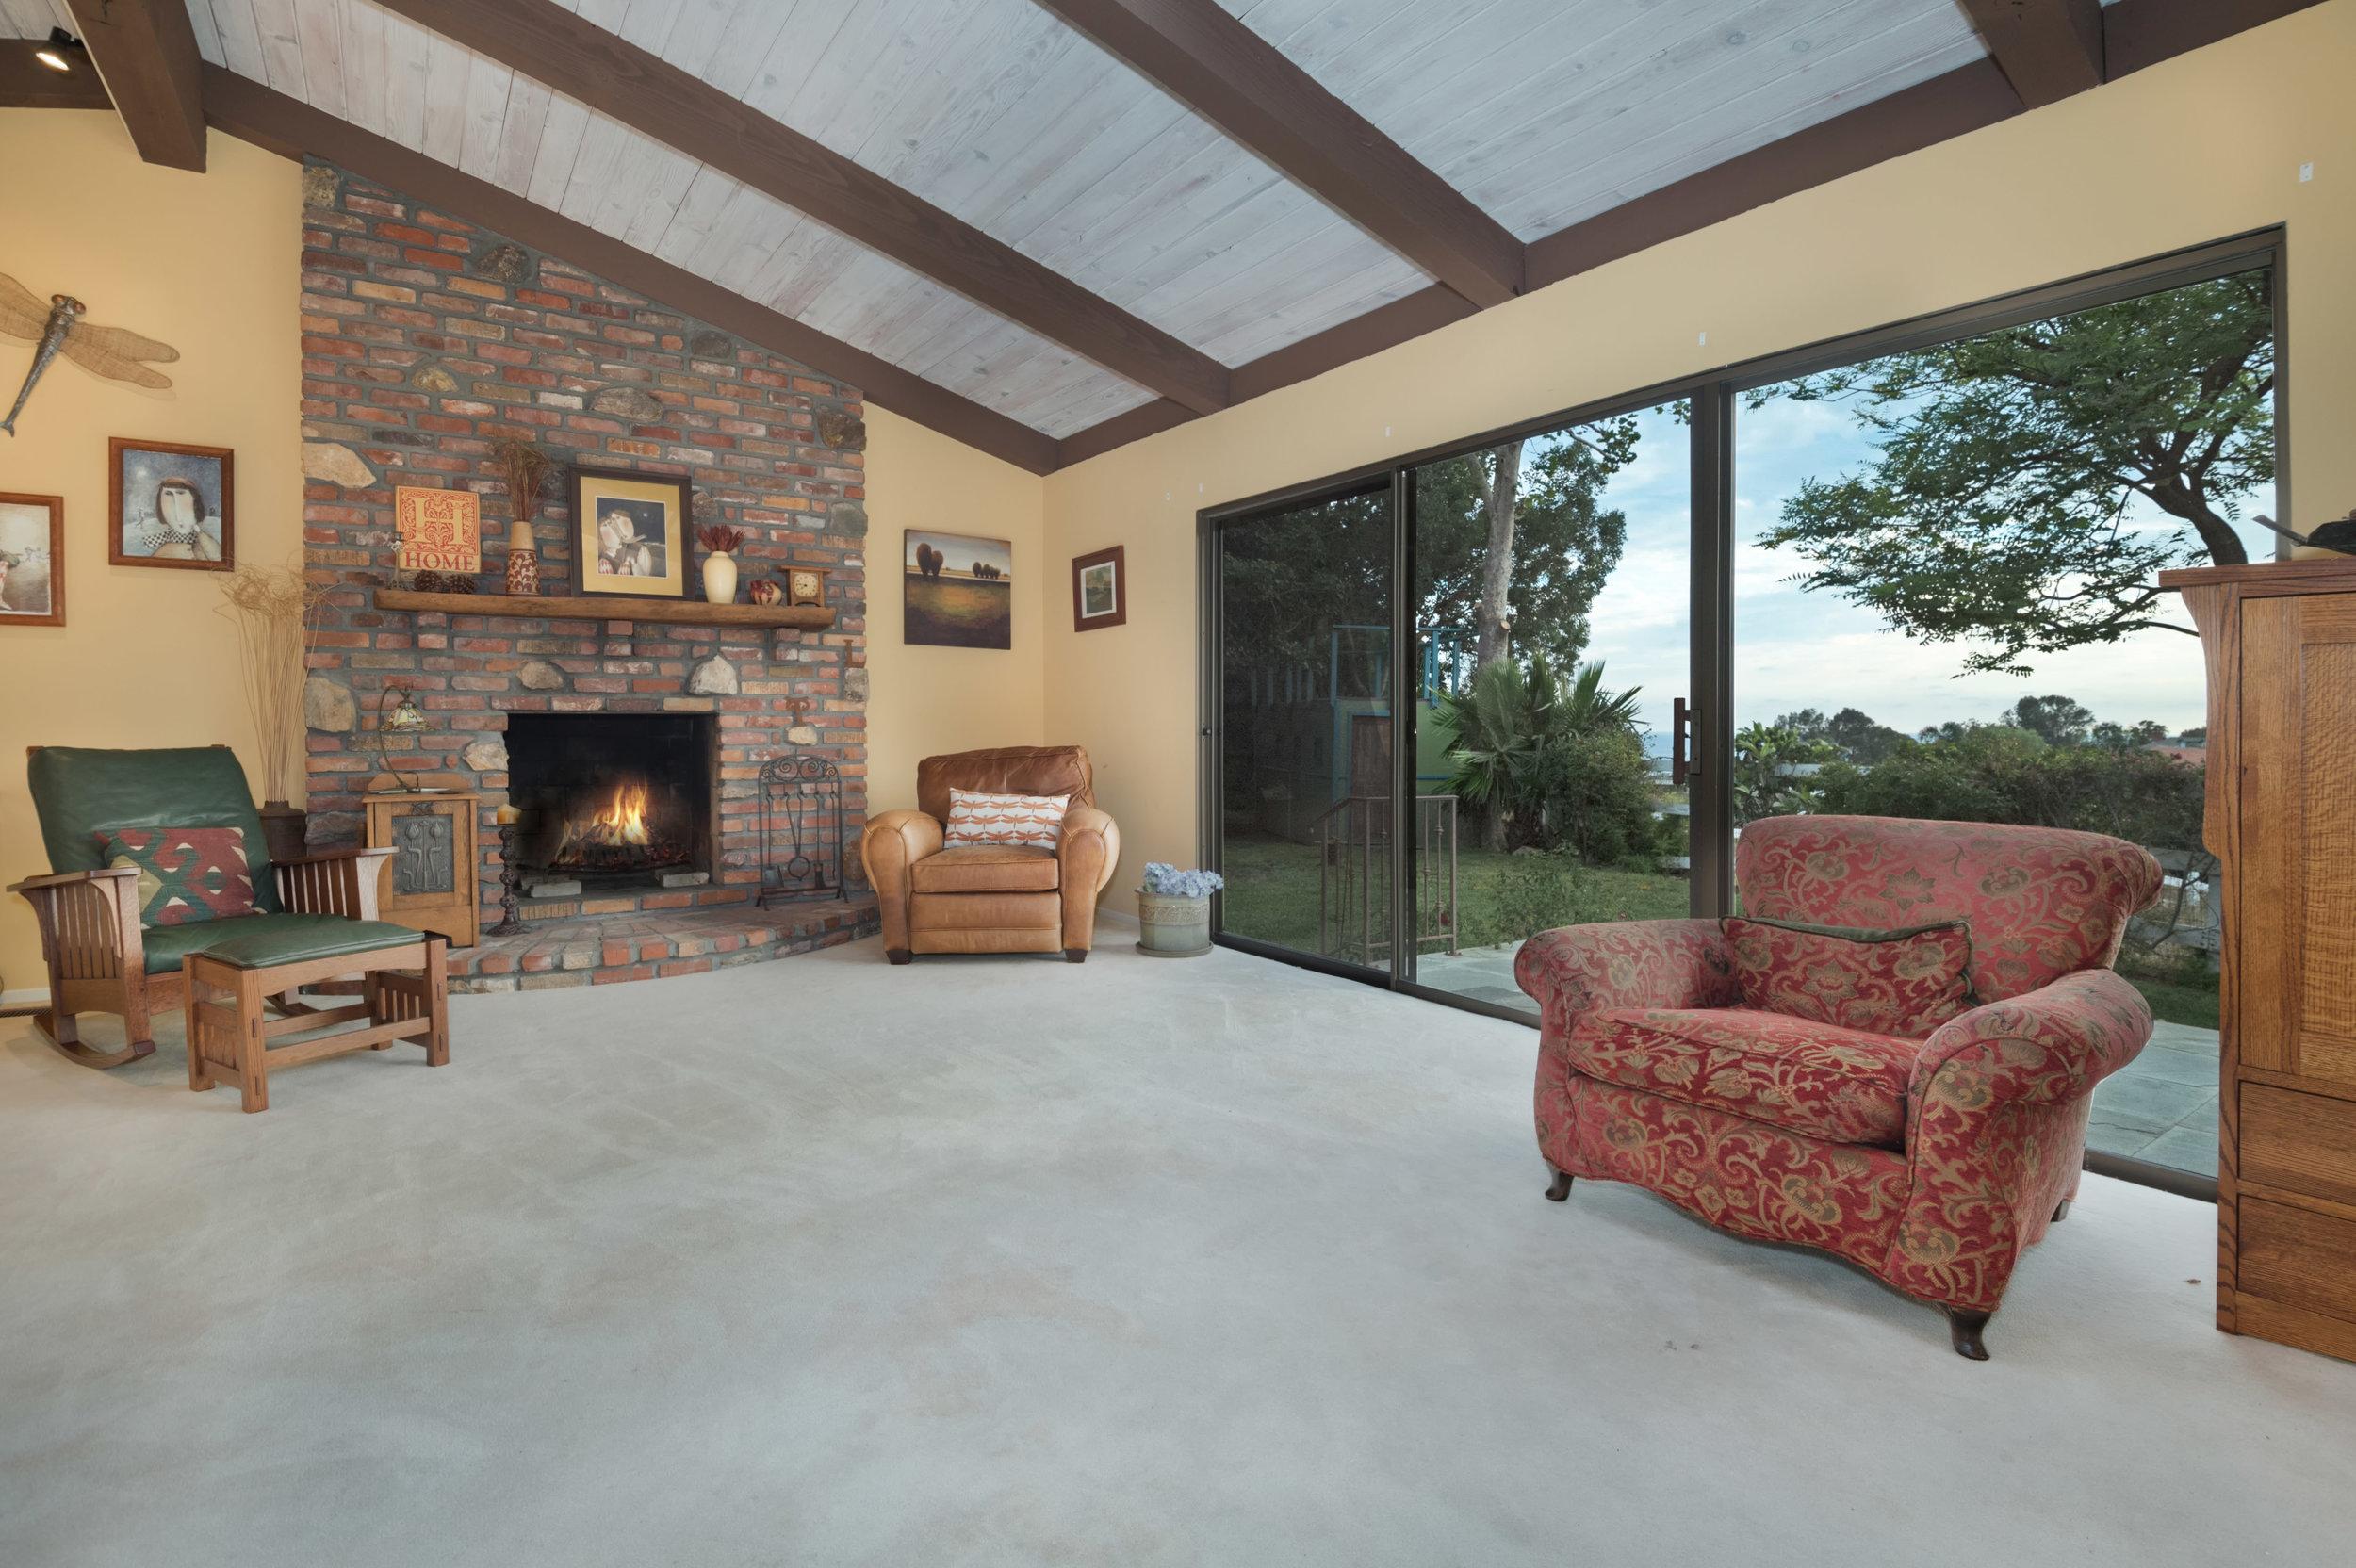 025 guest house 29660 Harvester Road Malibu For Sale The Malibu Life Team Luxury Real Estate.jpg